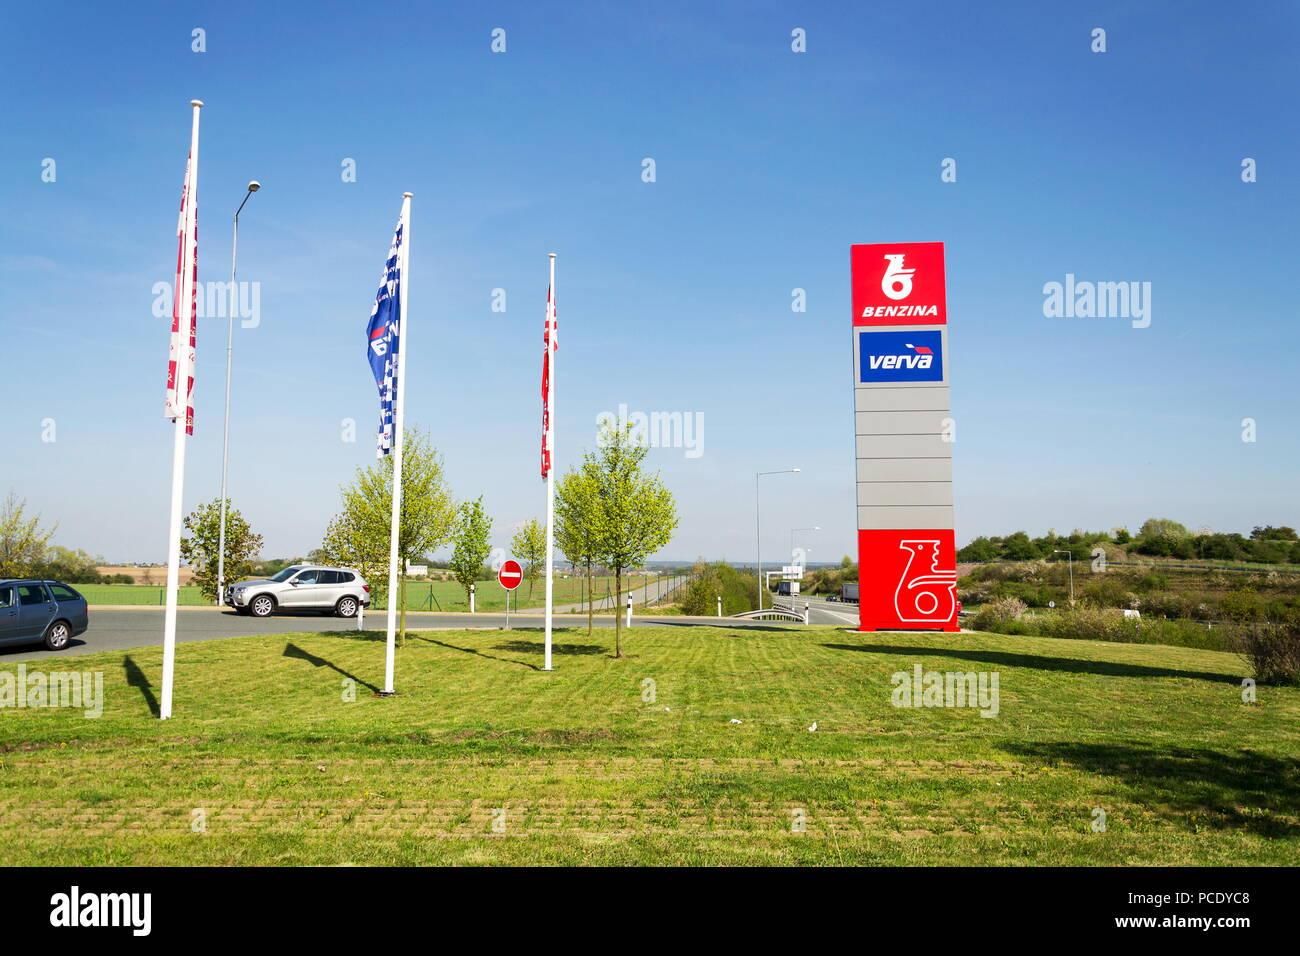 OSICE, CZECH REPUBLIC - APRIL 20 2018: Benzina oil and gas company